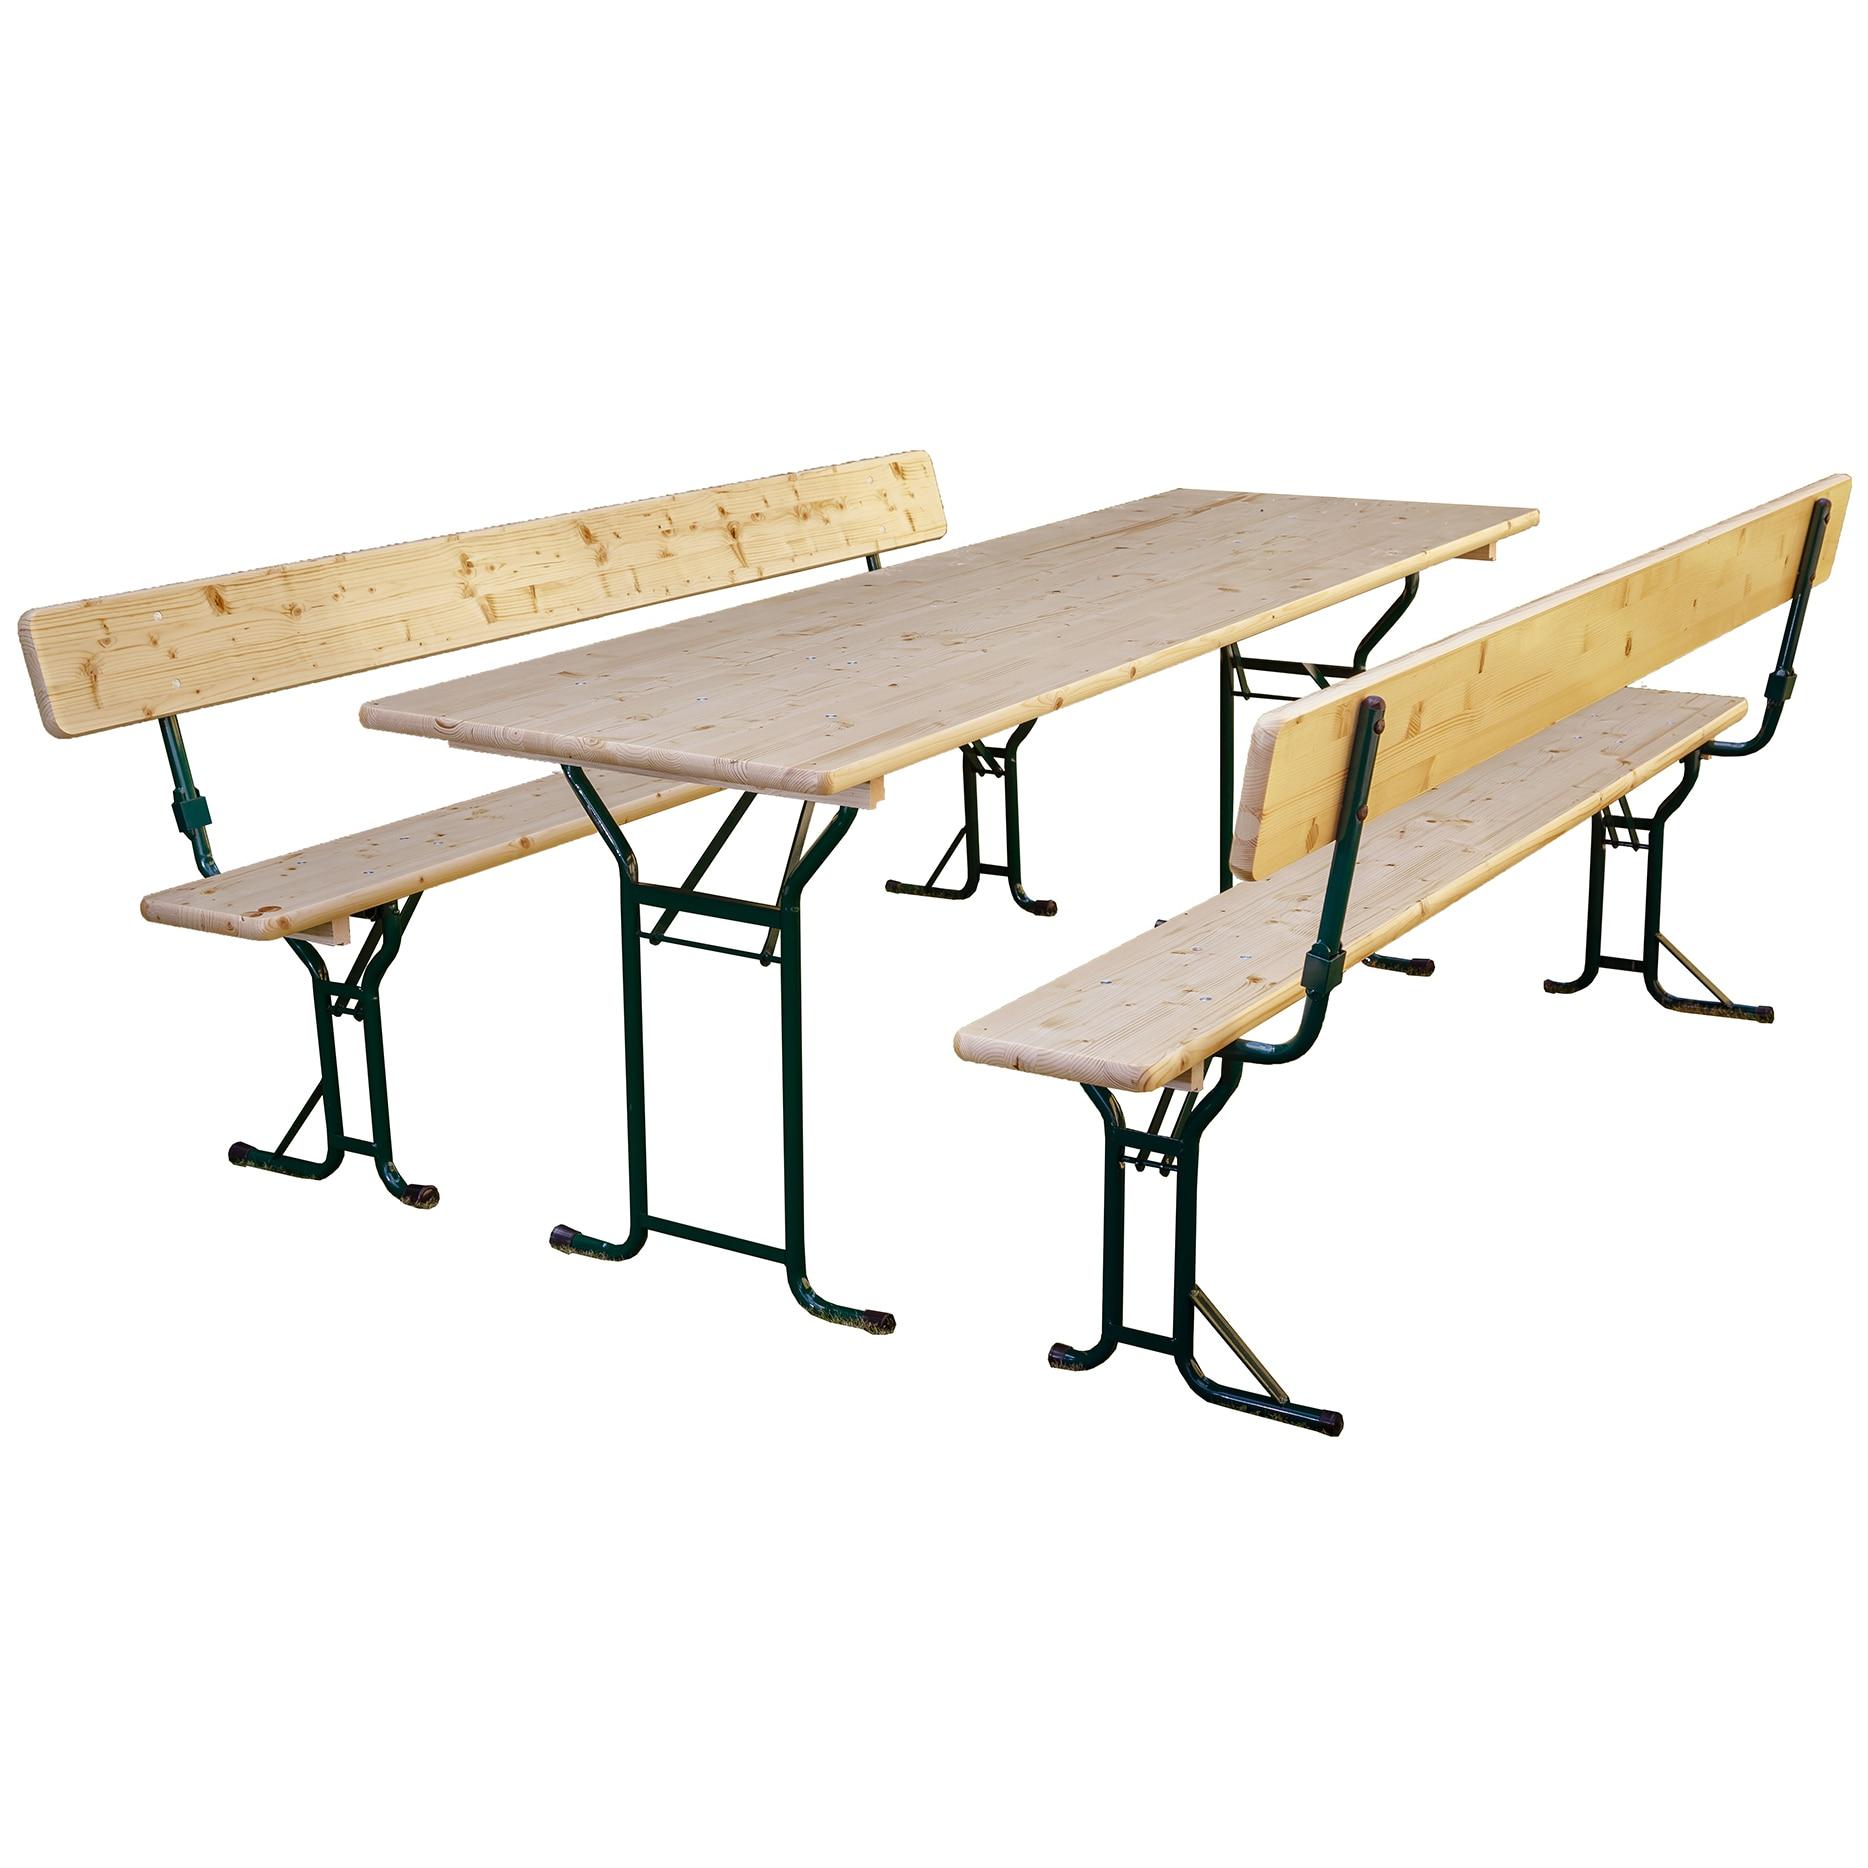 Fotografie Set mobilier gradina/berarie lemn natur, masa 70x220 cm , 2 banci cu spatar 25x220 cm